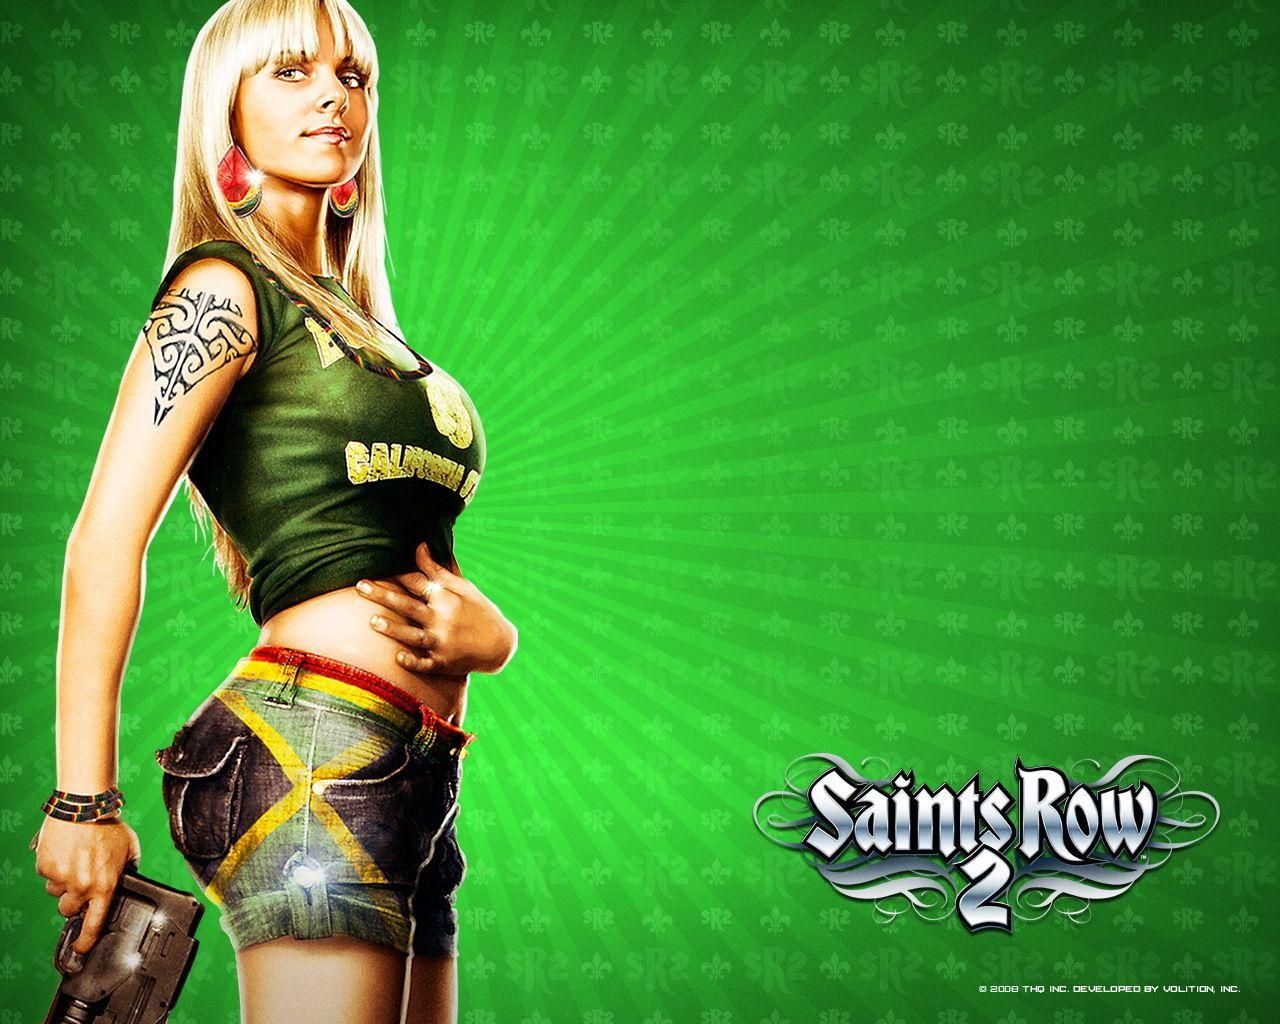 Desktop Wallpaper Saints Row h Games HD Images